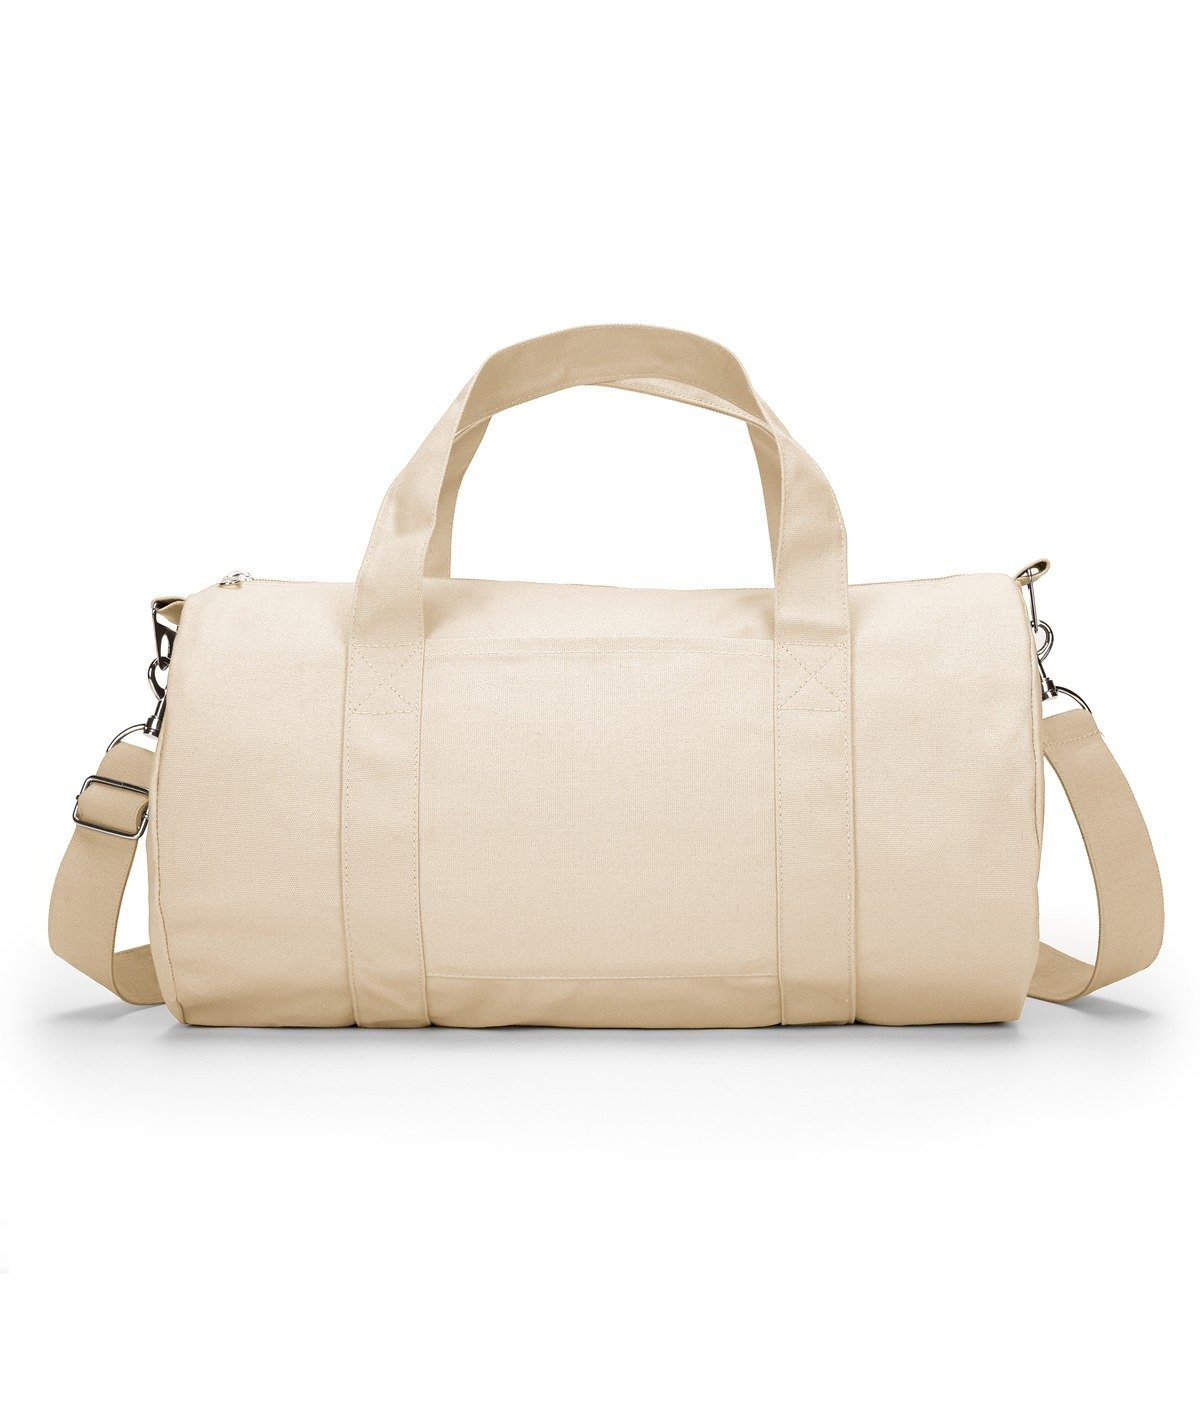 Liberty Bags 3301 GrantCotton Canvas Duffel Bag Natural Os by Liberty Bags (Image #1)